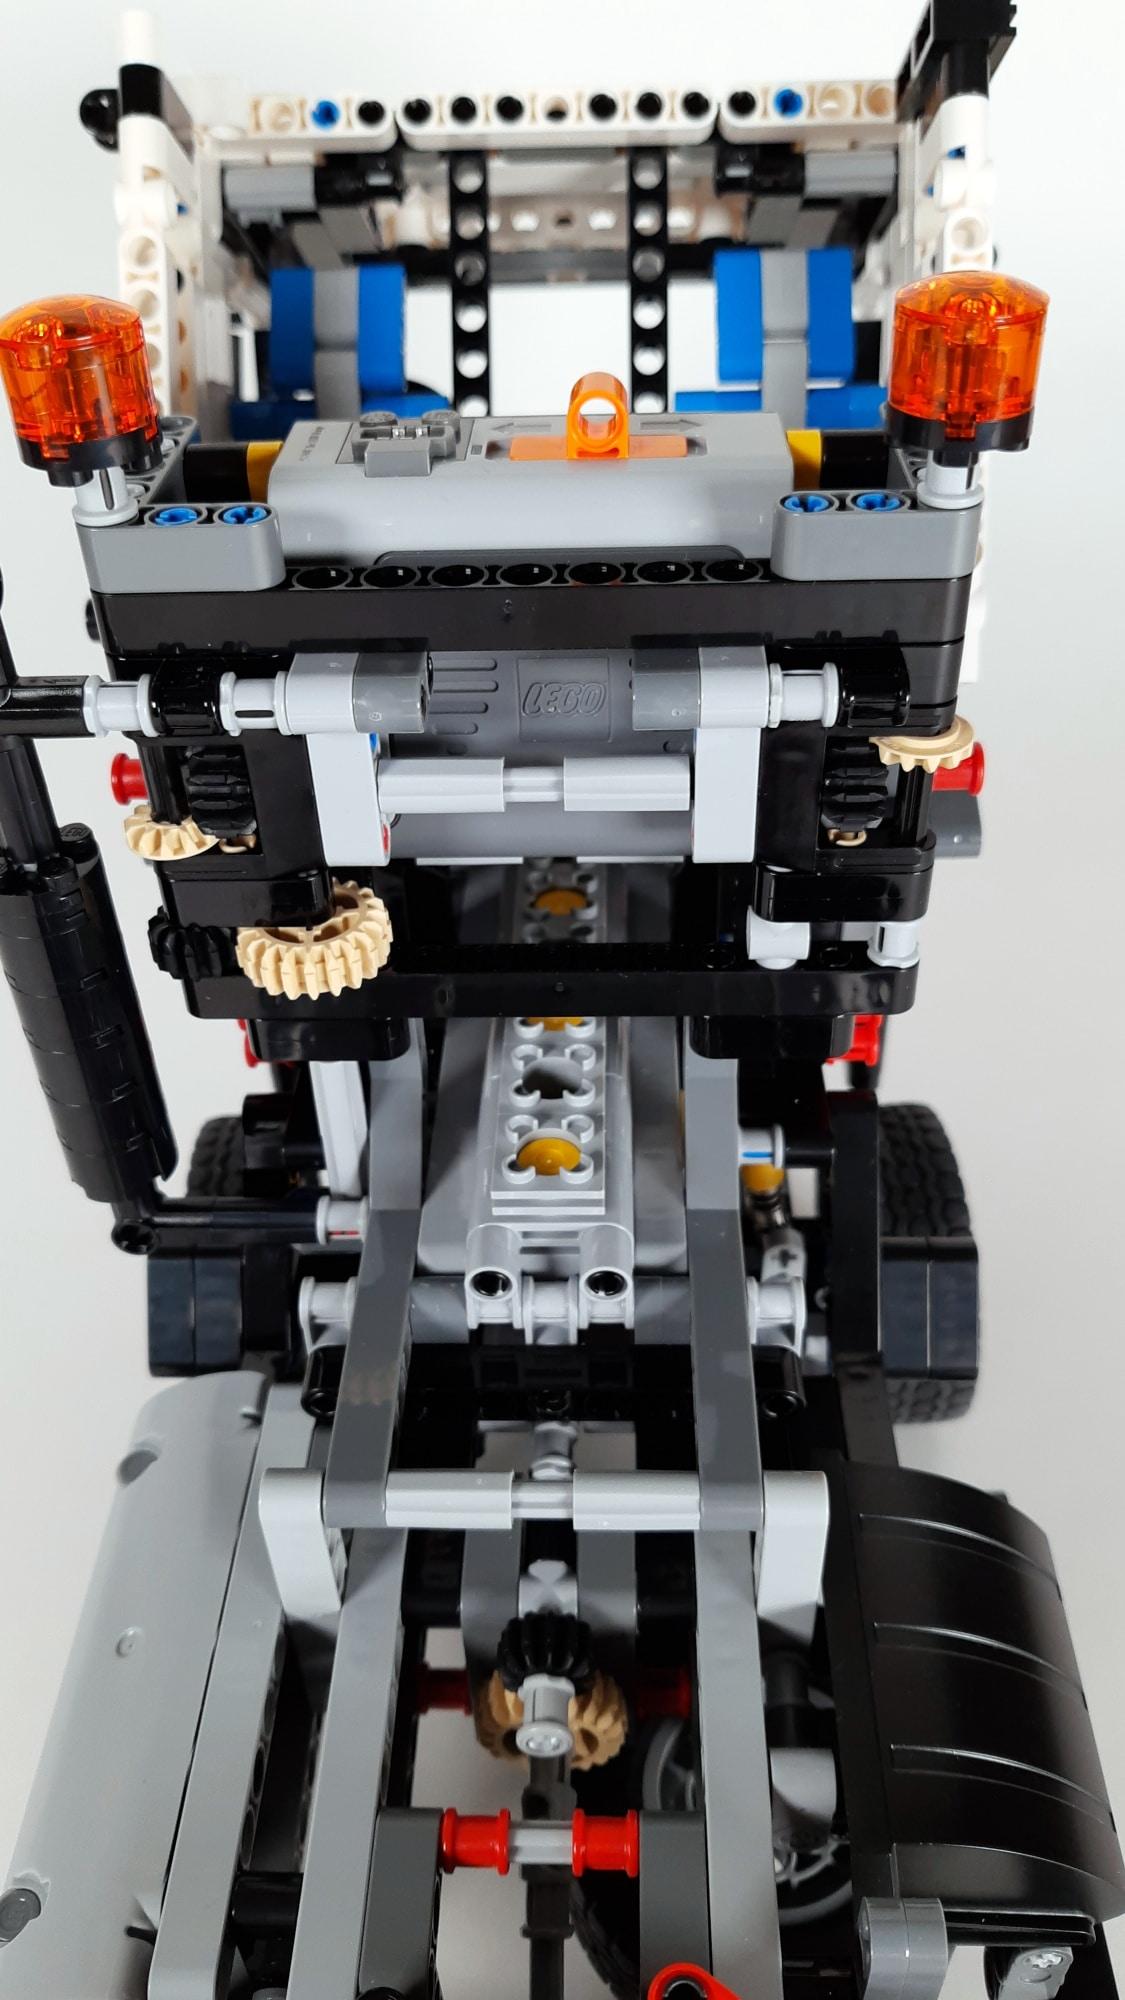 LEGO 42023 Mercedes-Benz Arocs B-Modell - Fakemotor